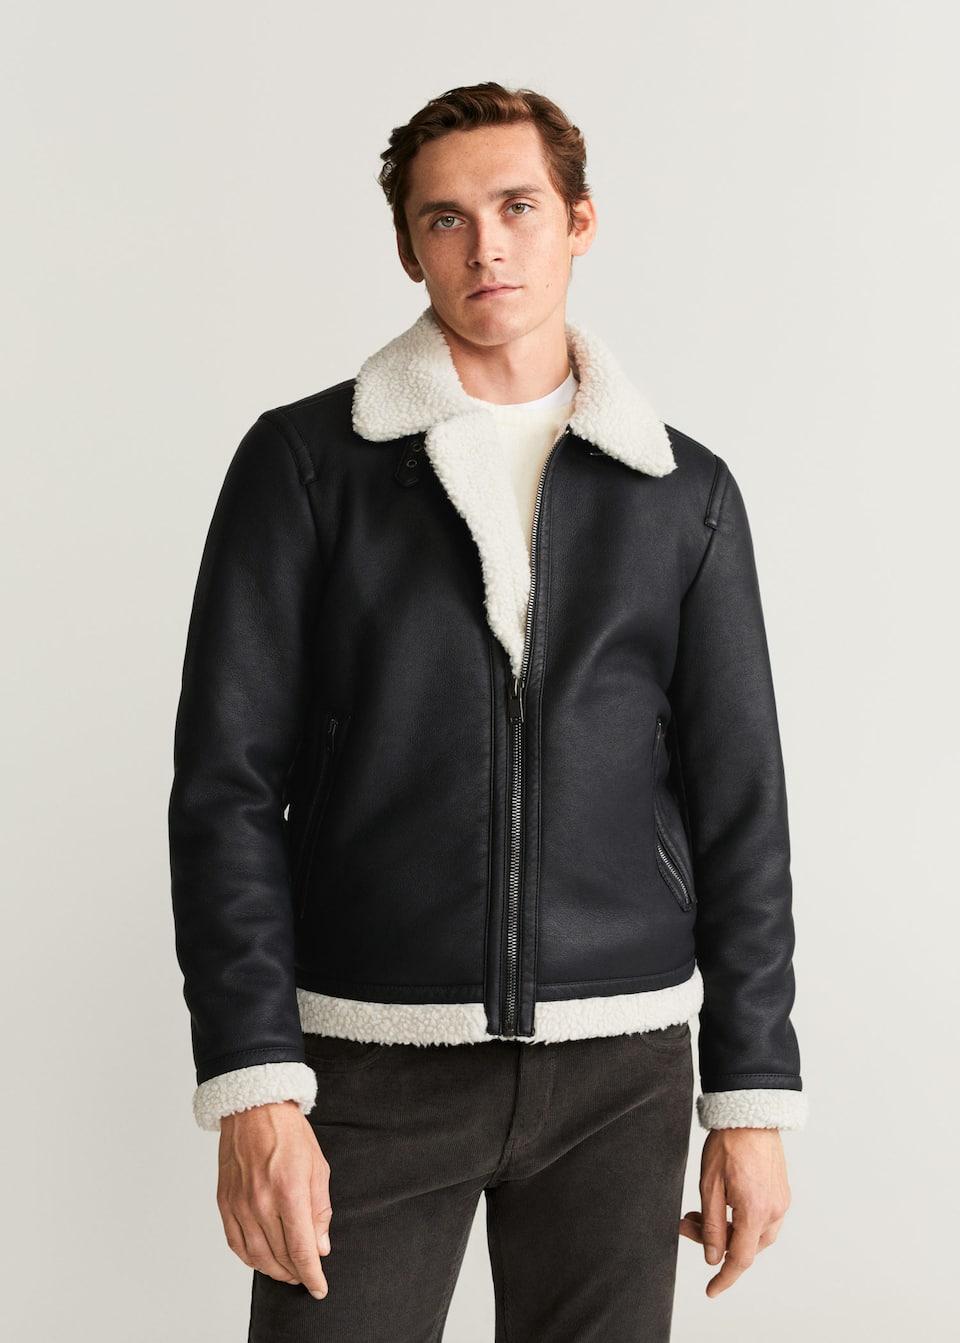 shearling / pile jacket from Mango